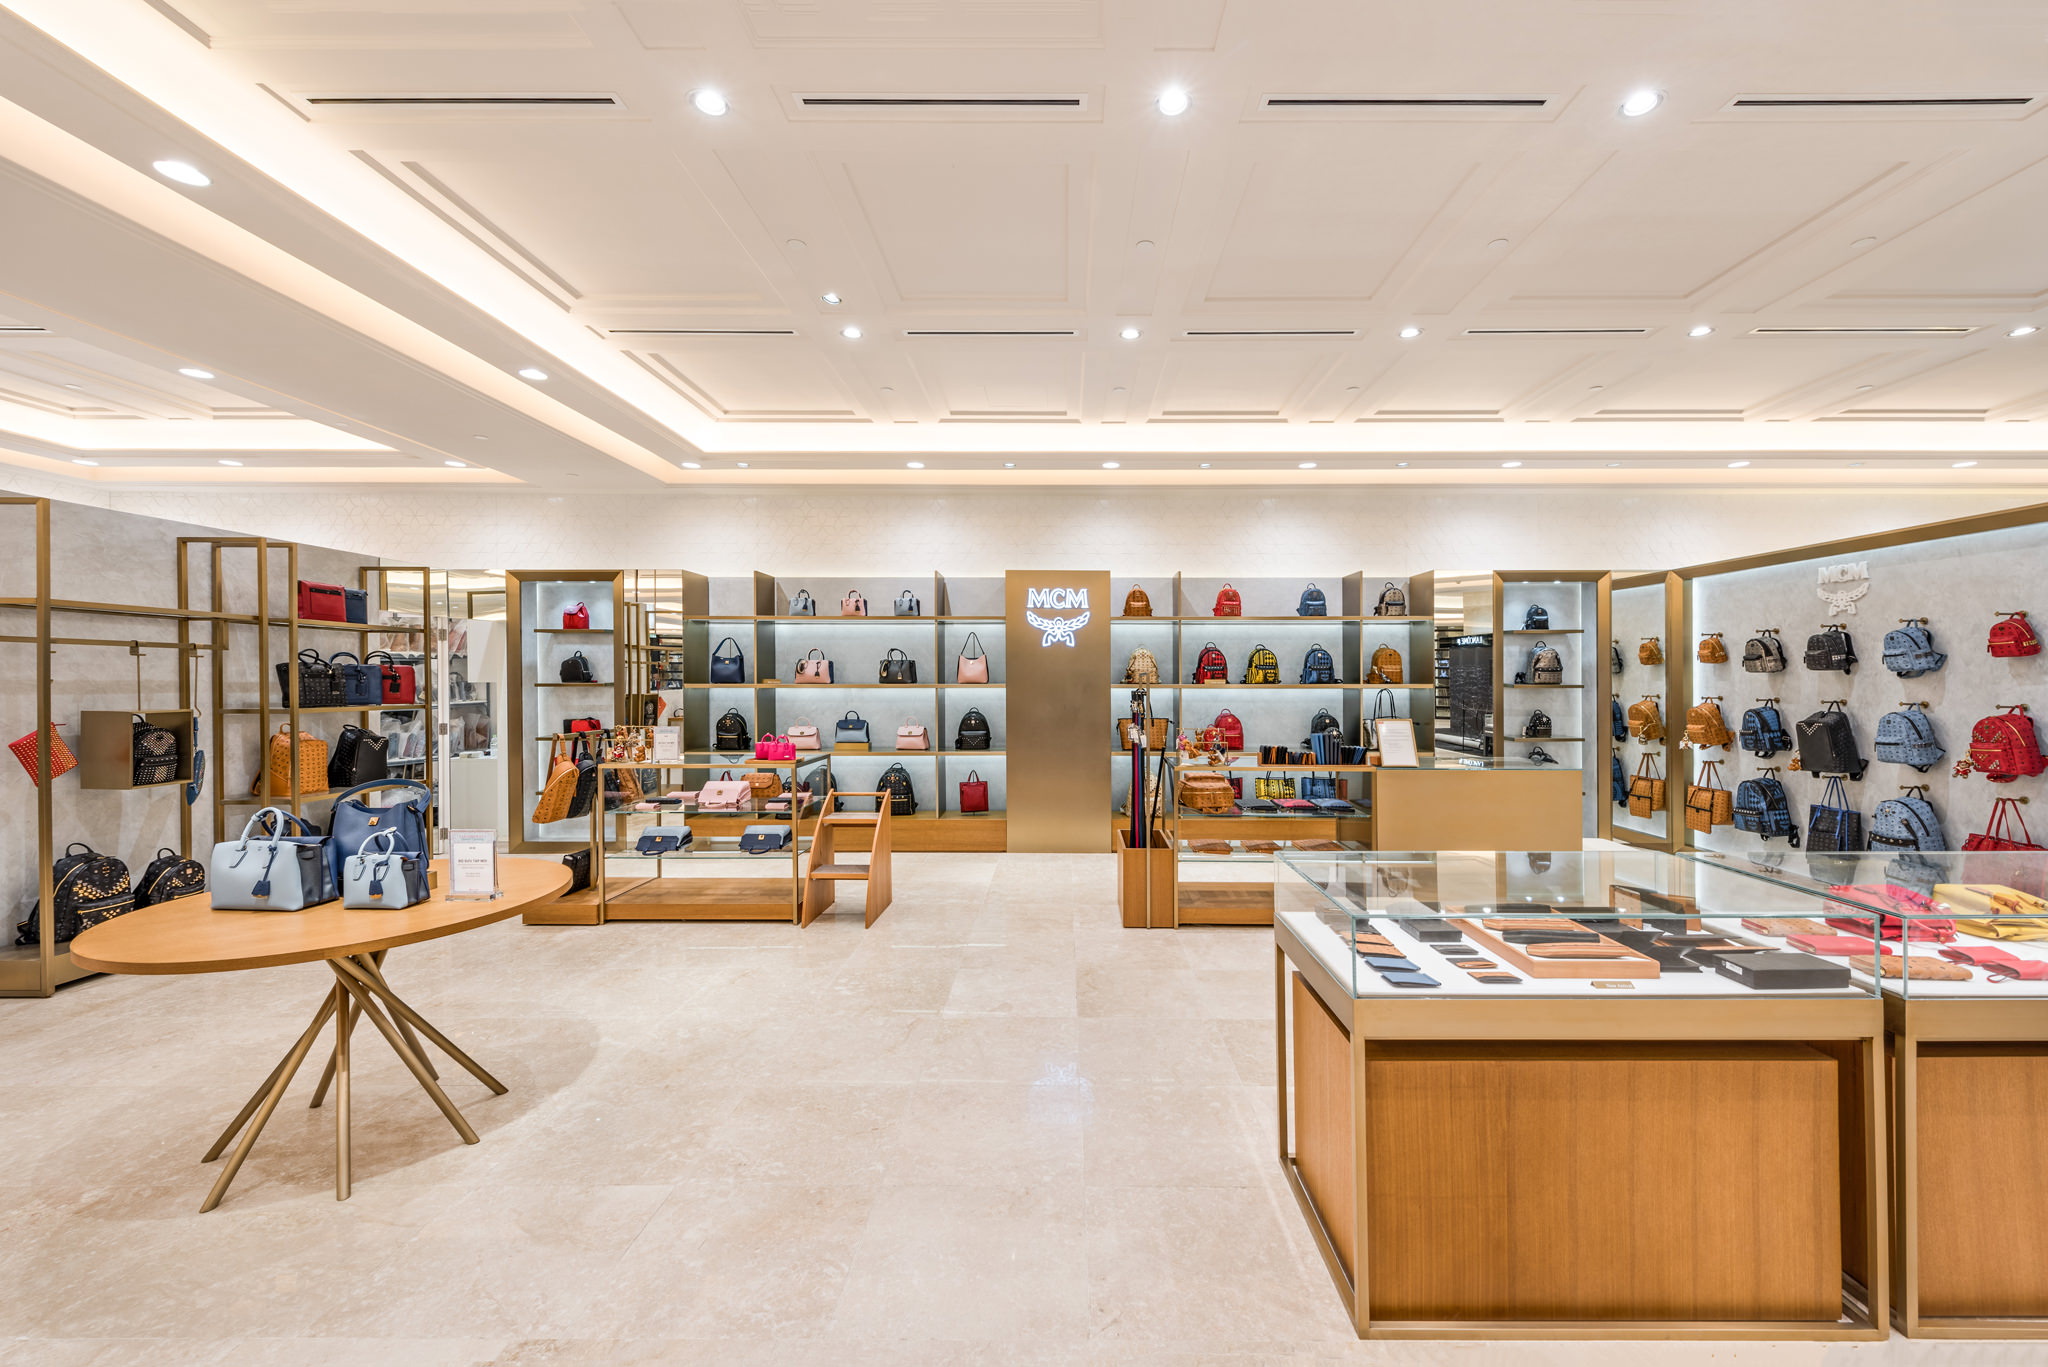 20160729 - MCM - HCM - Commercial - Interior - Store - Retouch 0004.jpg